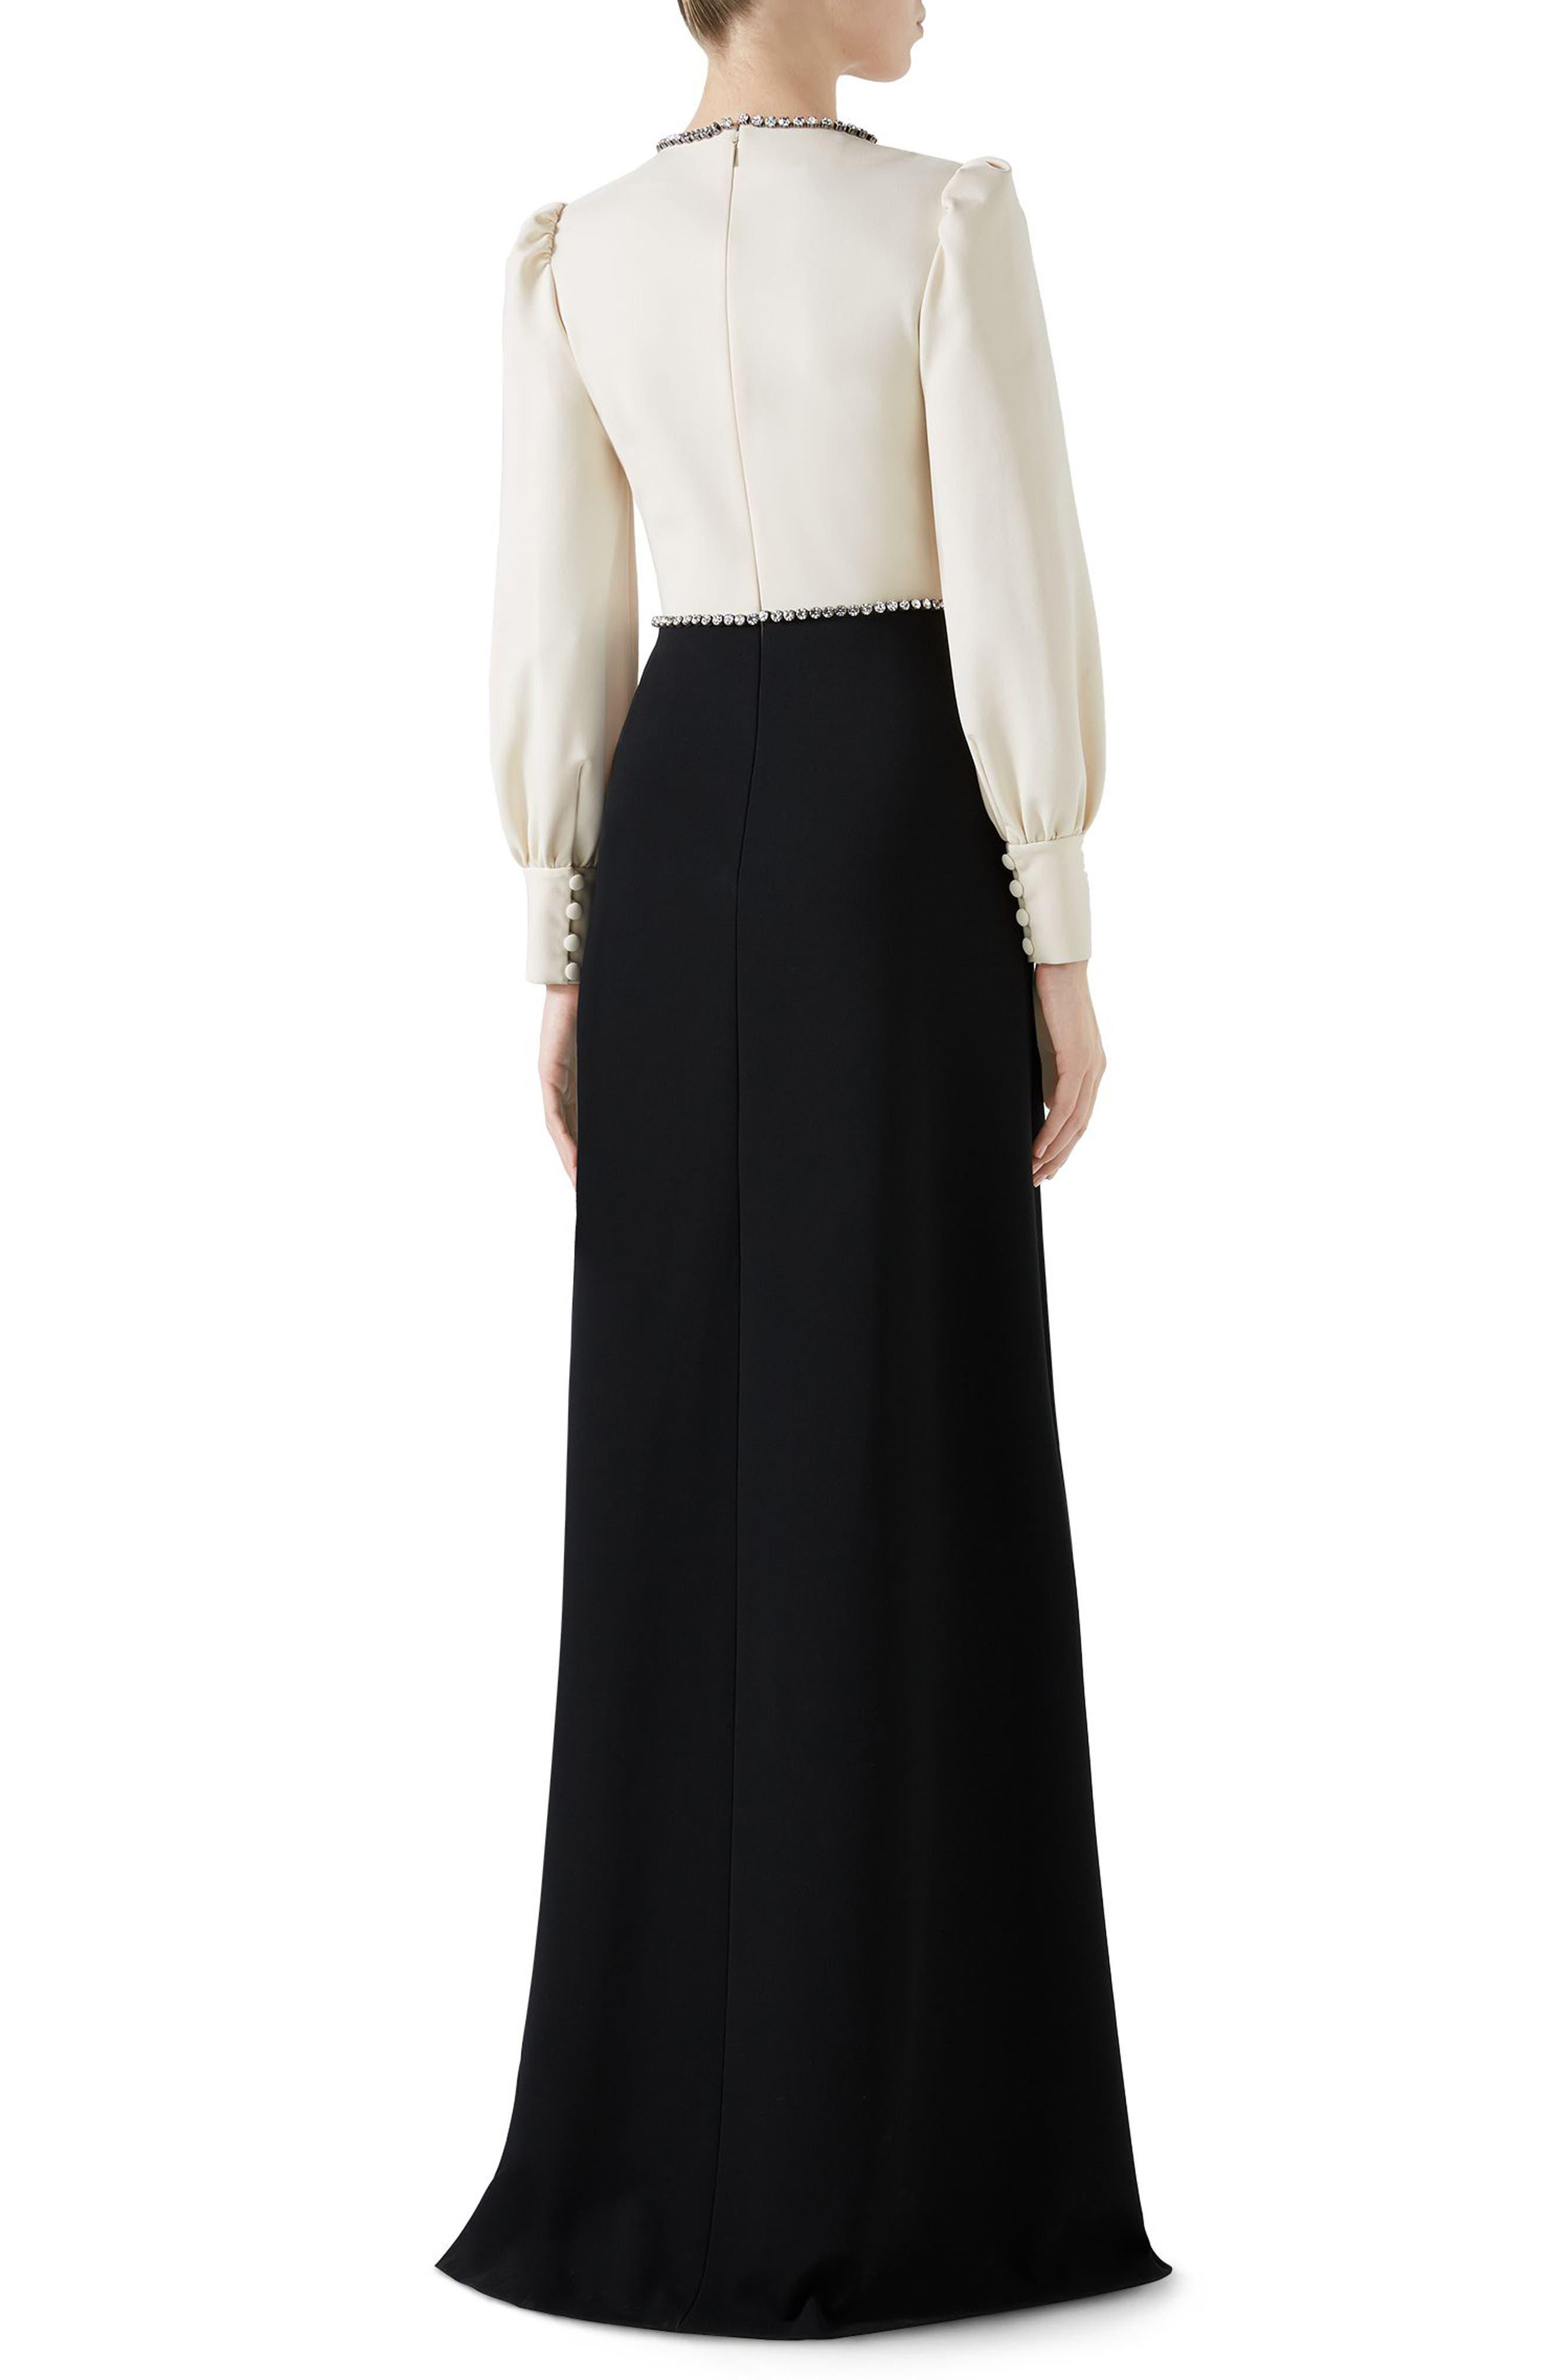 Trompe L'Oeil Bow Stretch Jersey Gown,                             Alternate thumbnail 2, color,                             BLACK/ ALMOND FLOWER